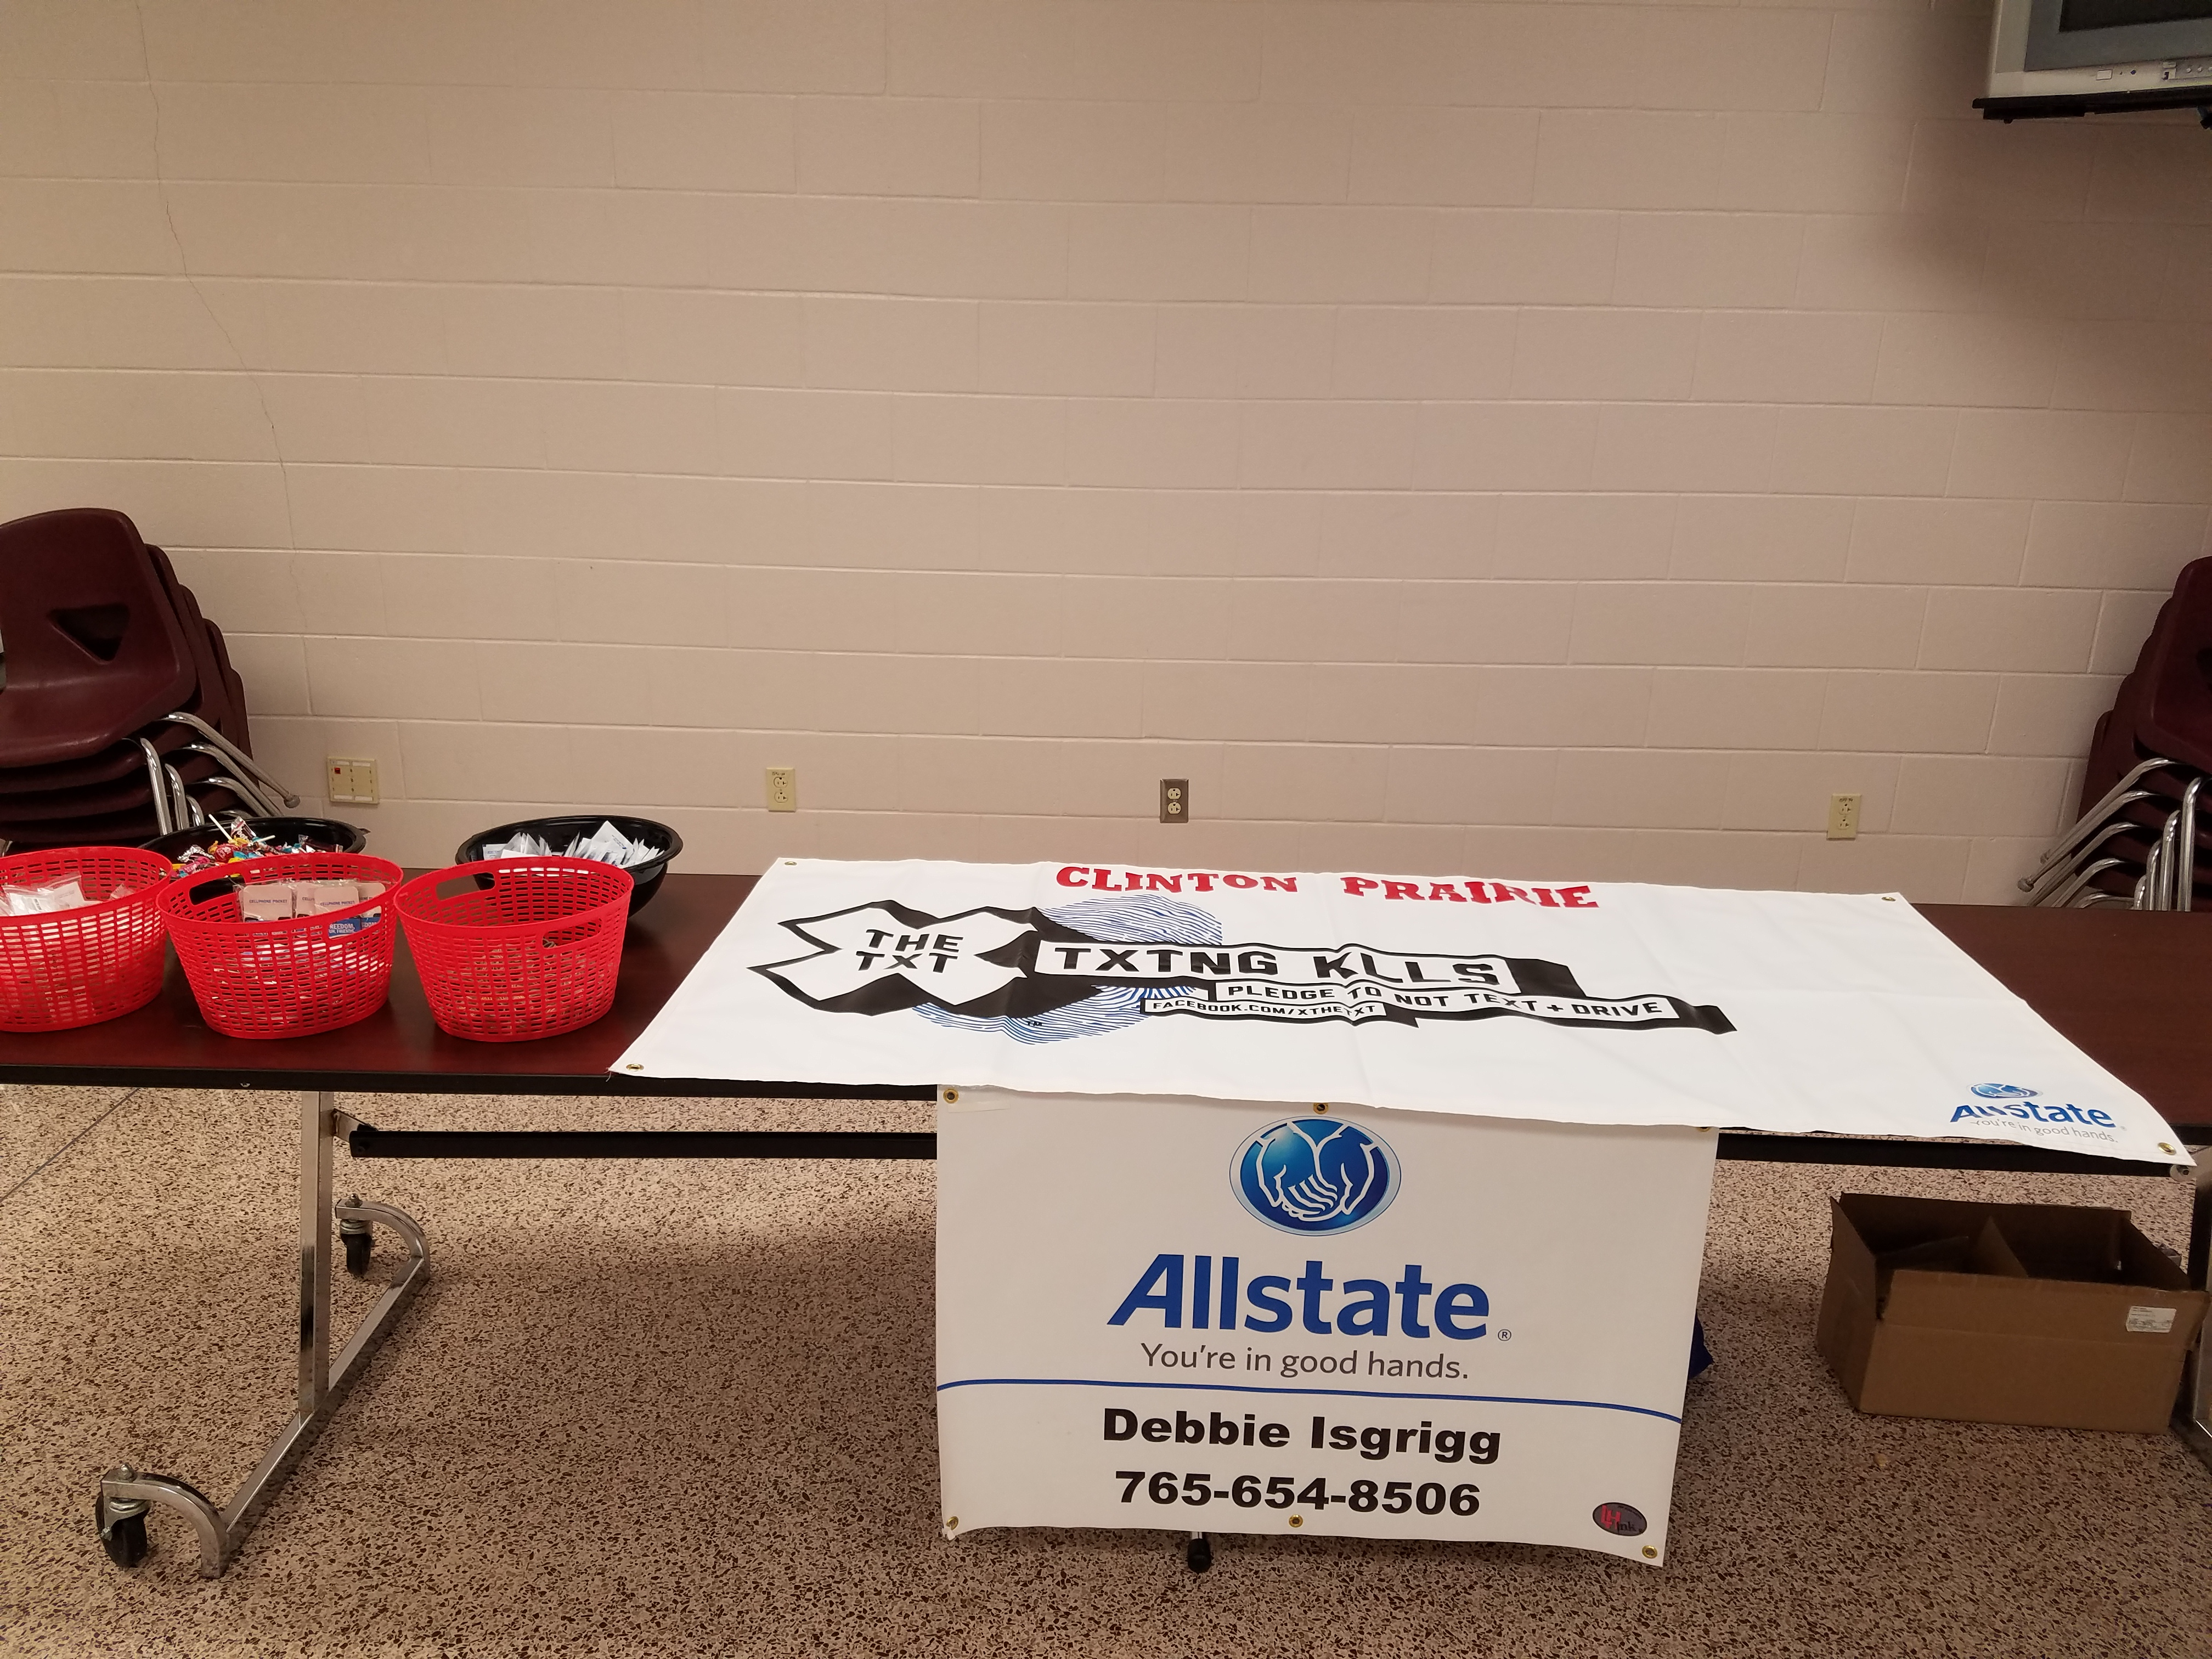 Allstate Insurance Agent: Debbie Isgrigg image 8